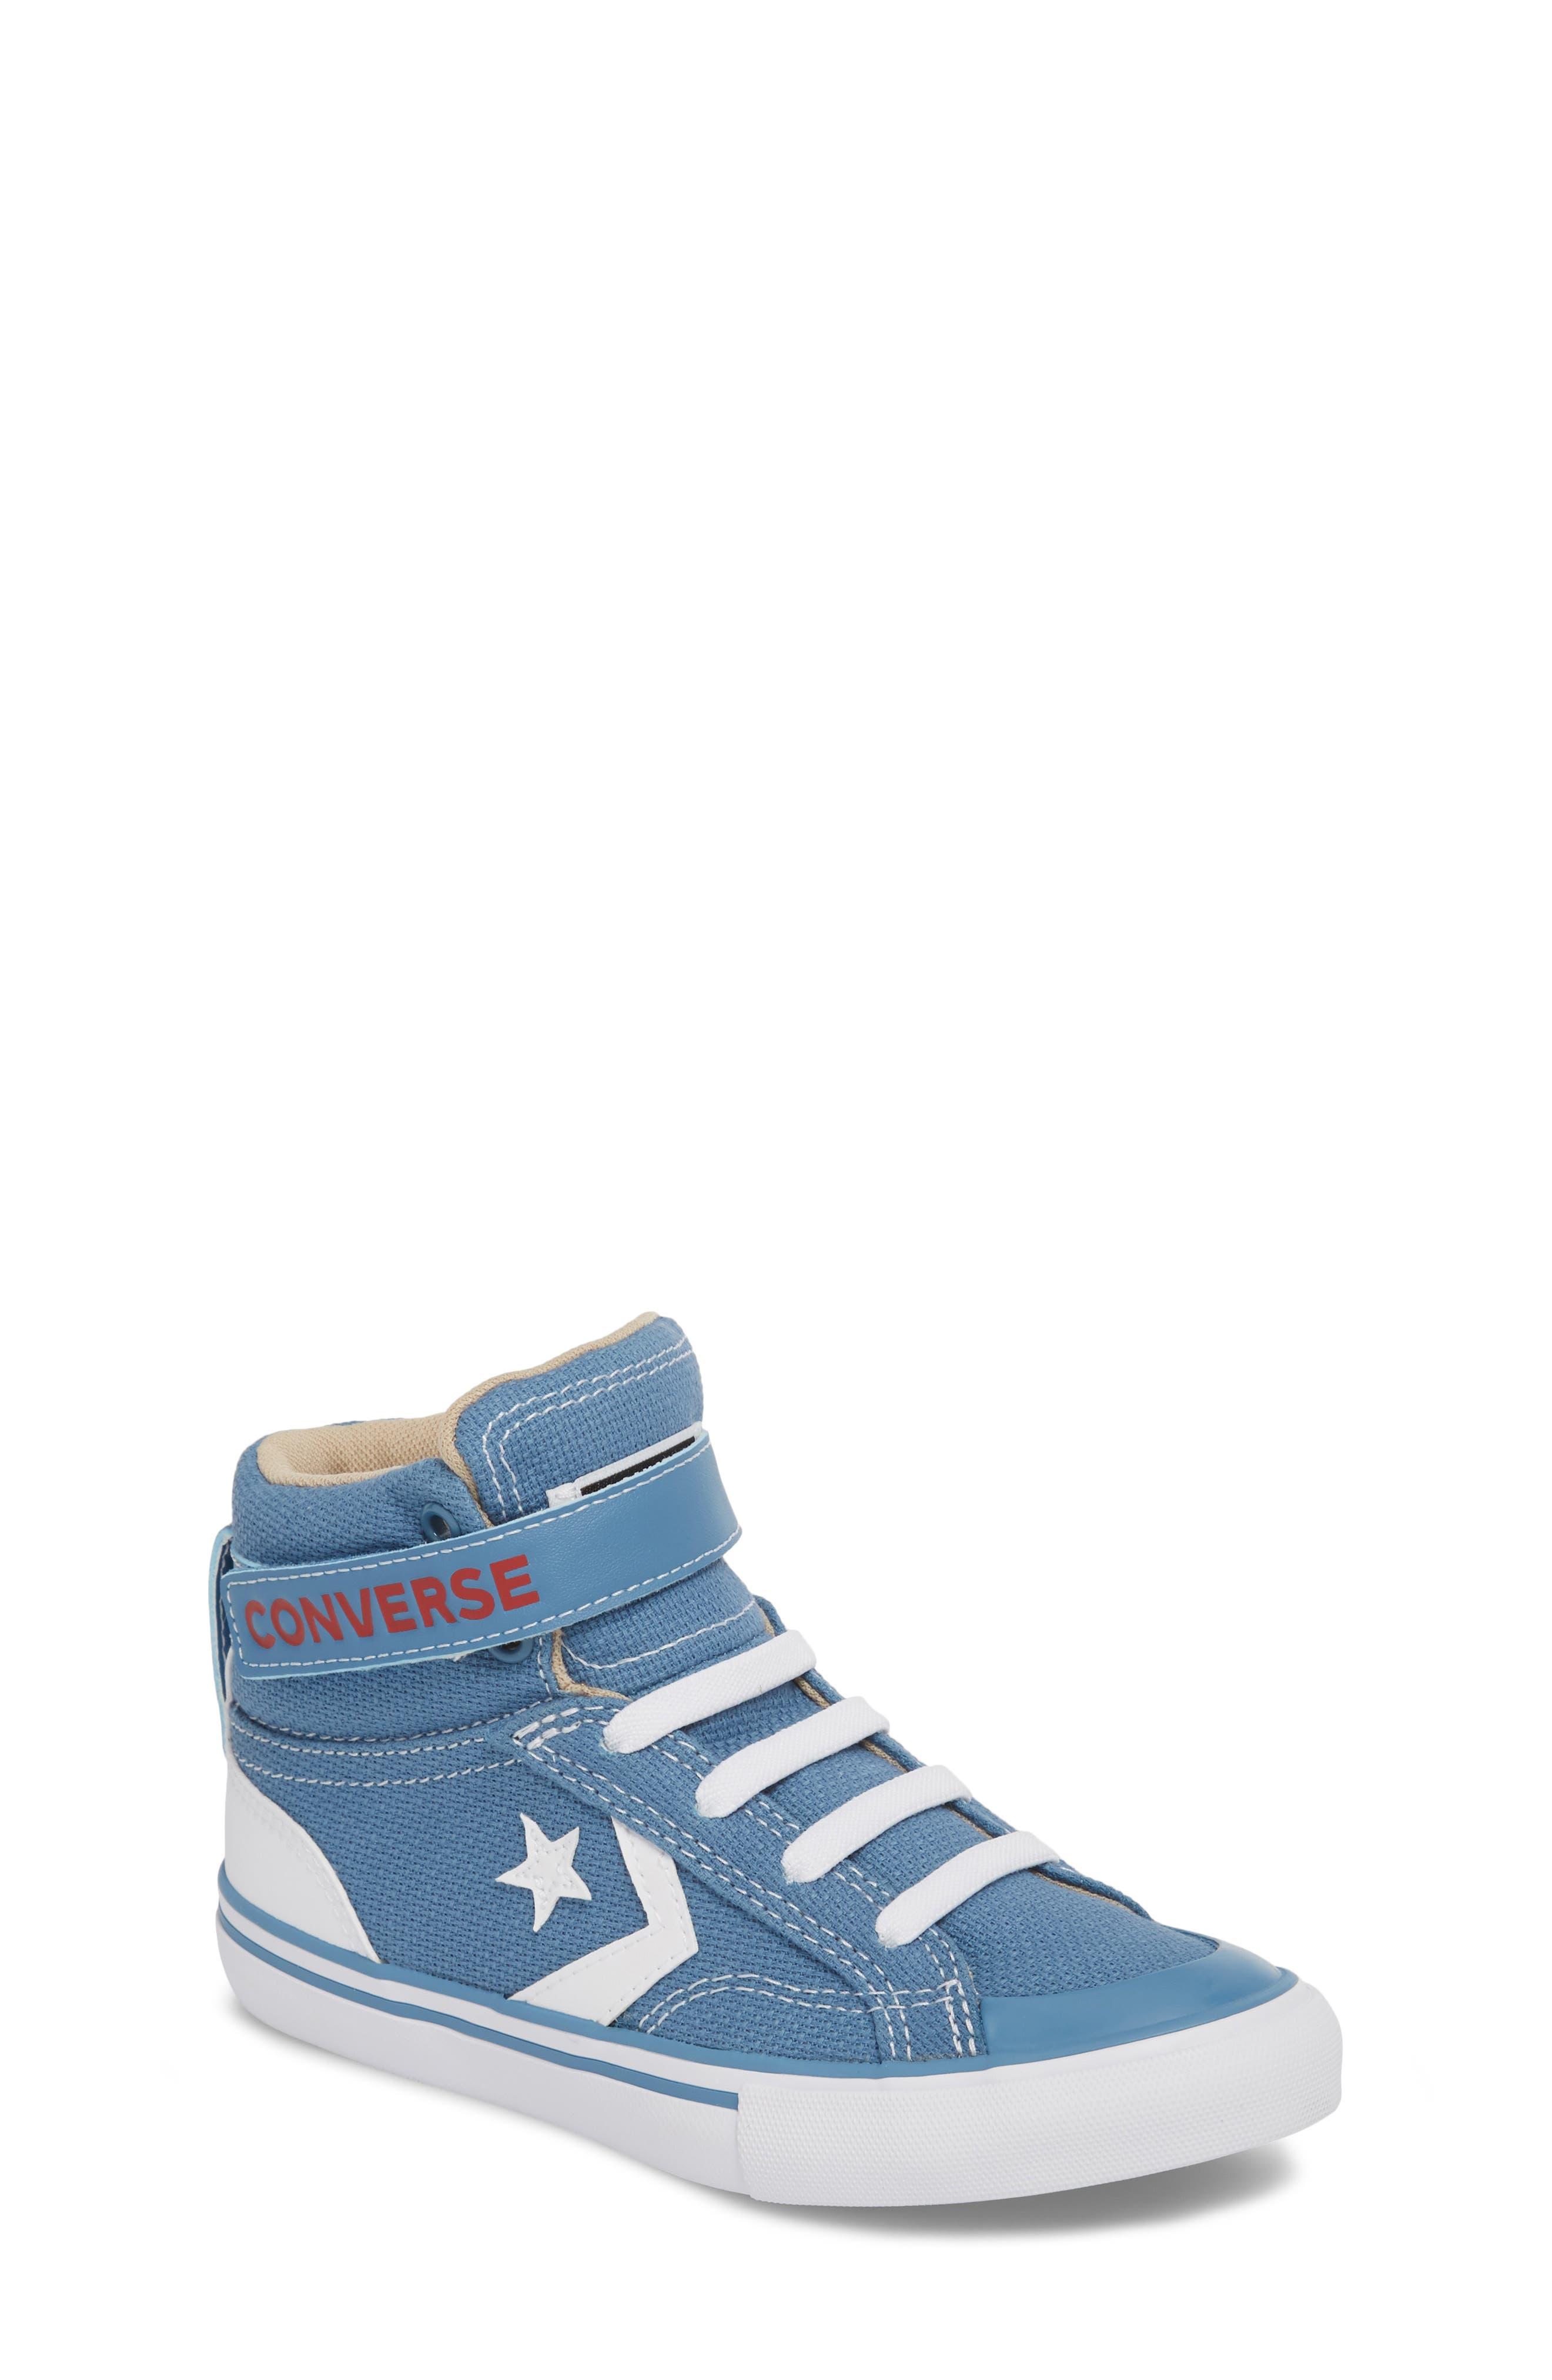 Pro Blaze High Top Sneaker,                             Main thumbnail 1, color,